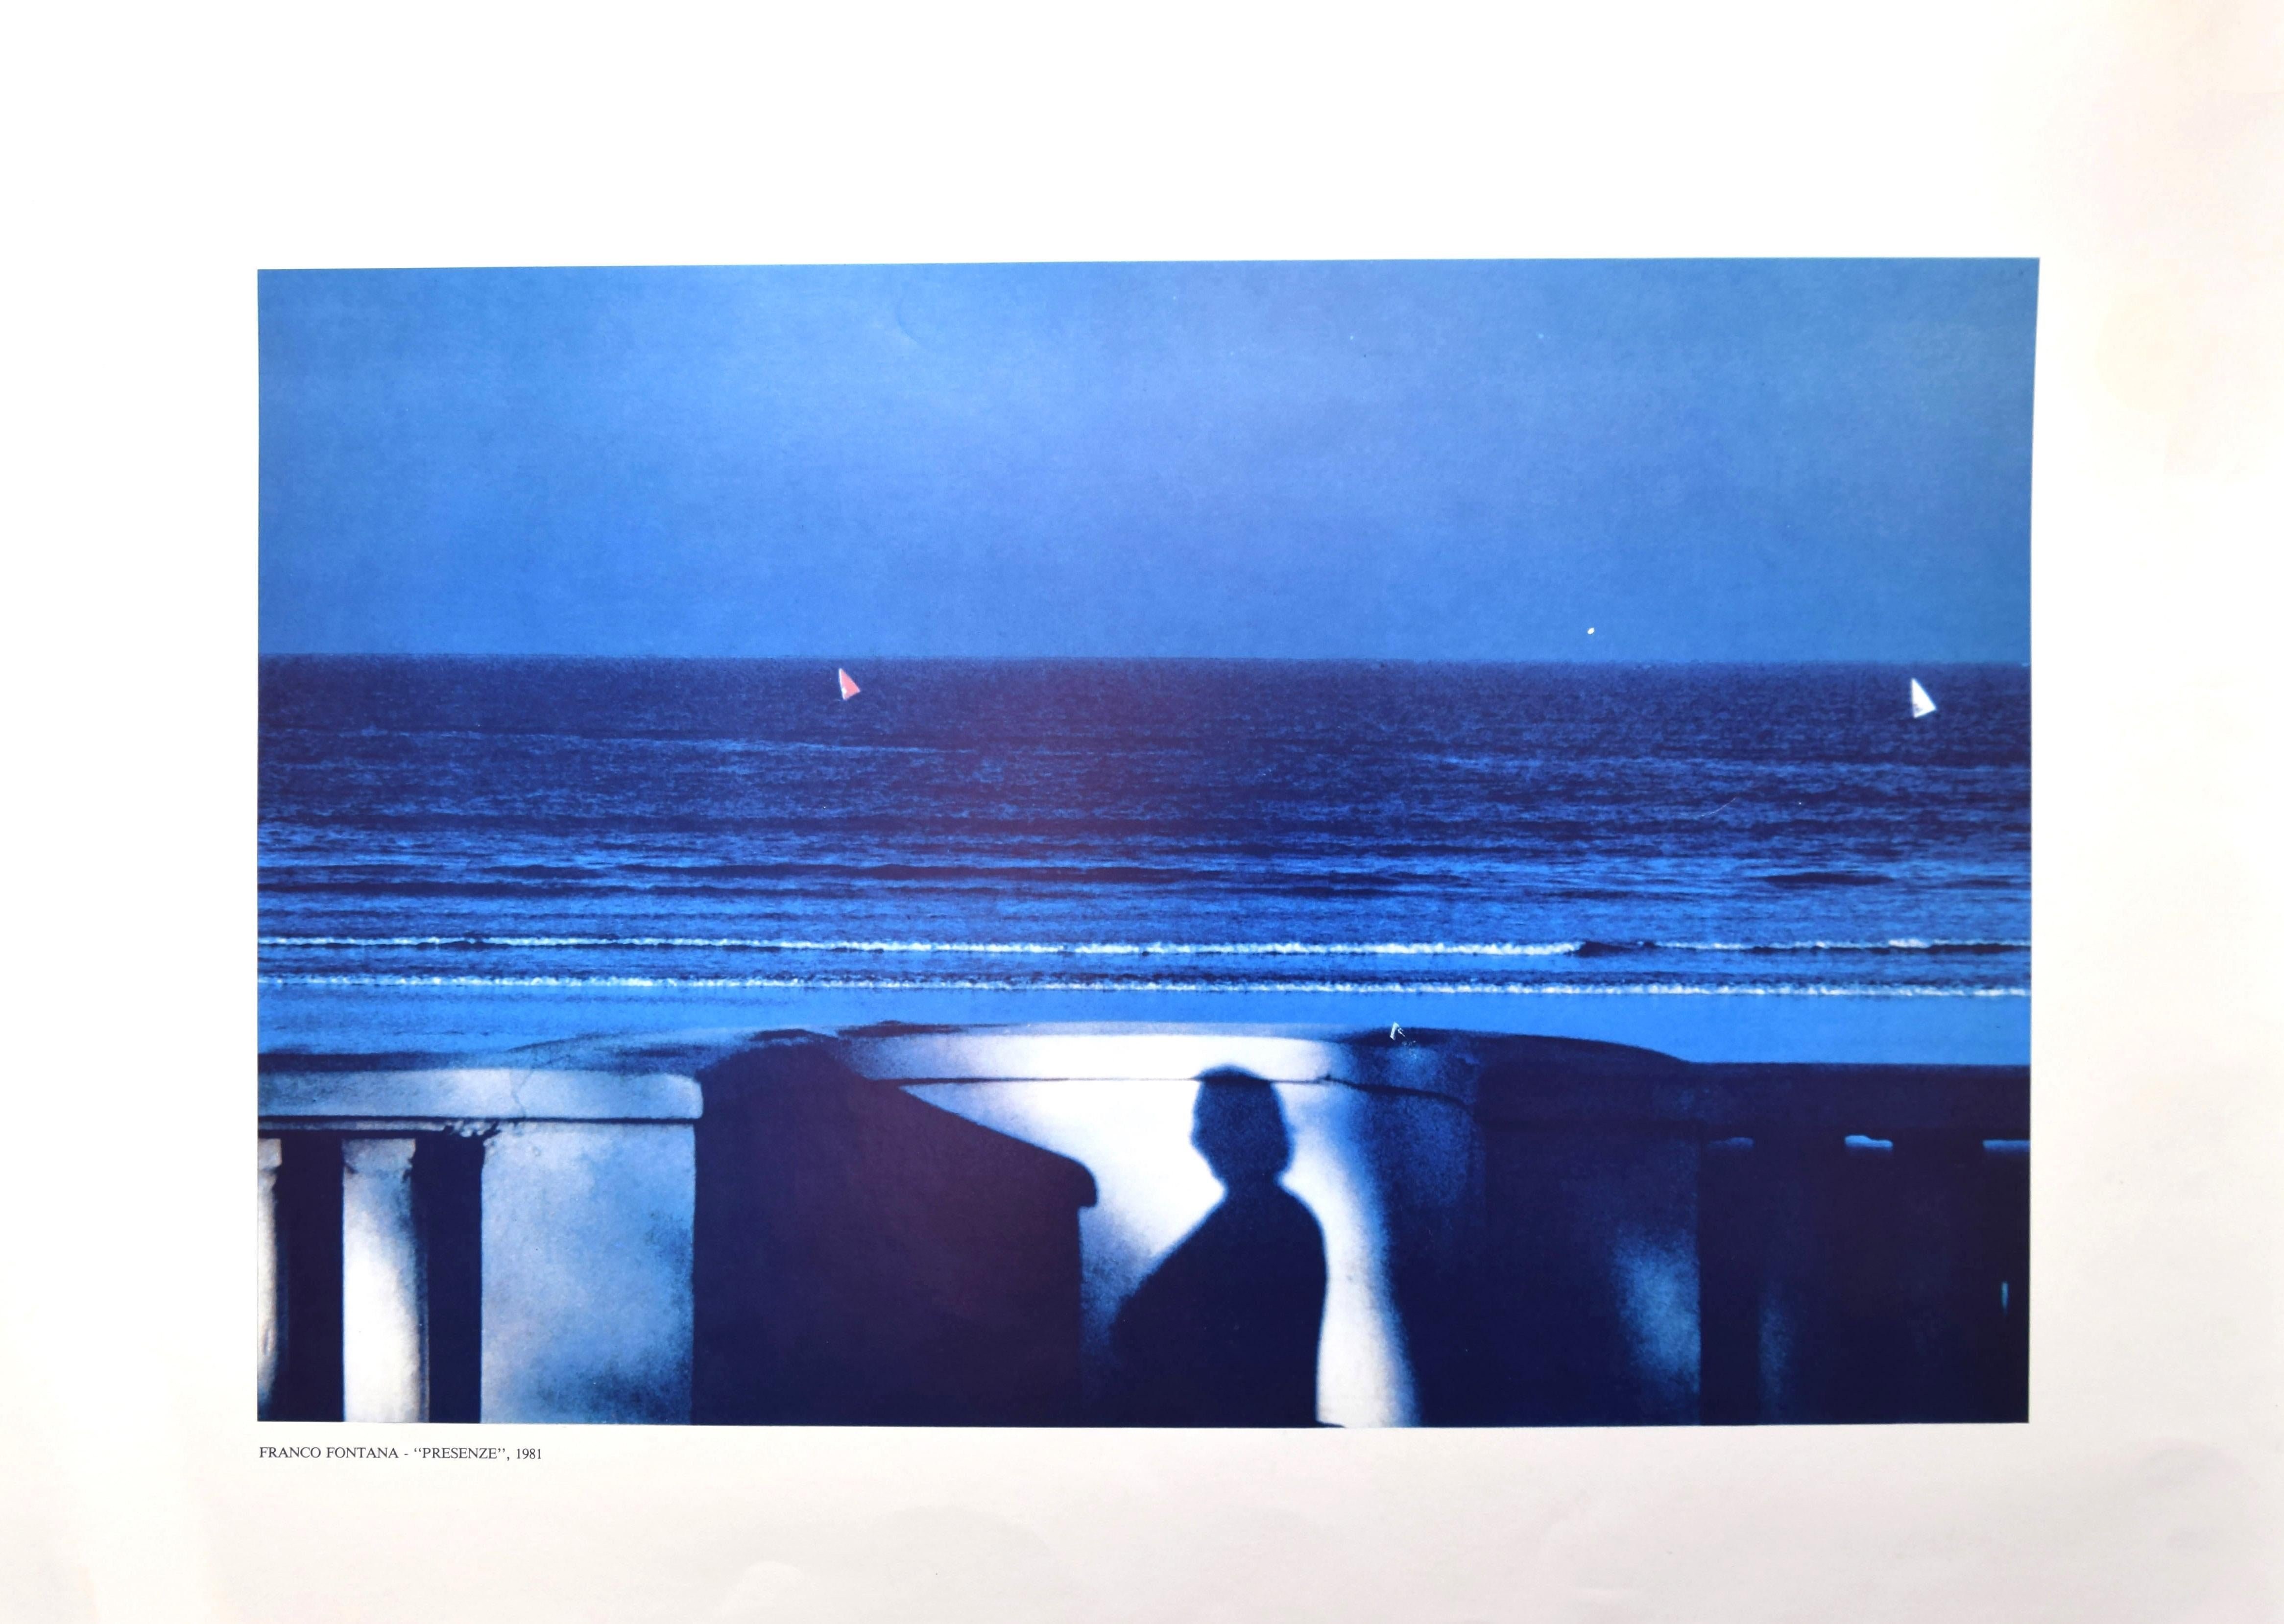 Attendance Blue Sea - Vintage Offset Print by Franco Fontana - 1981